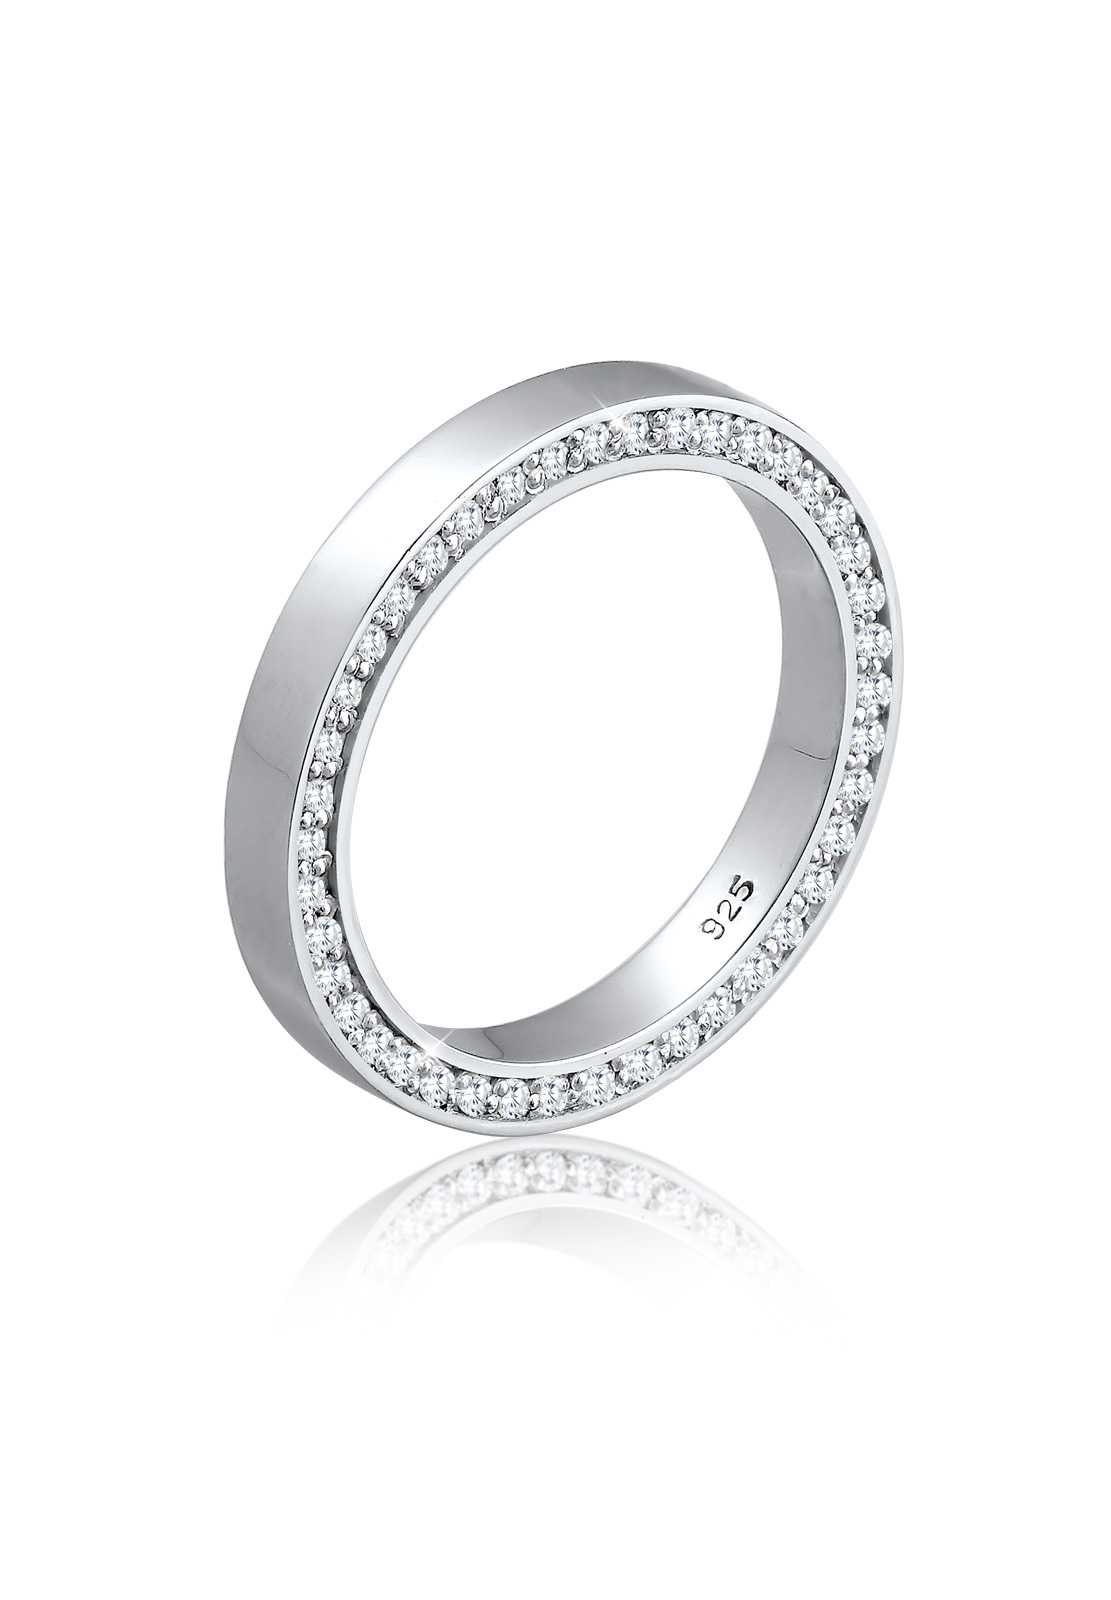 Bandring   Zirkonia ( Weiß )   925er Sterling Silber